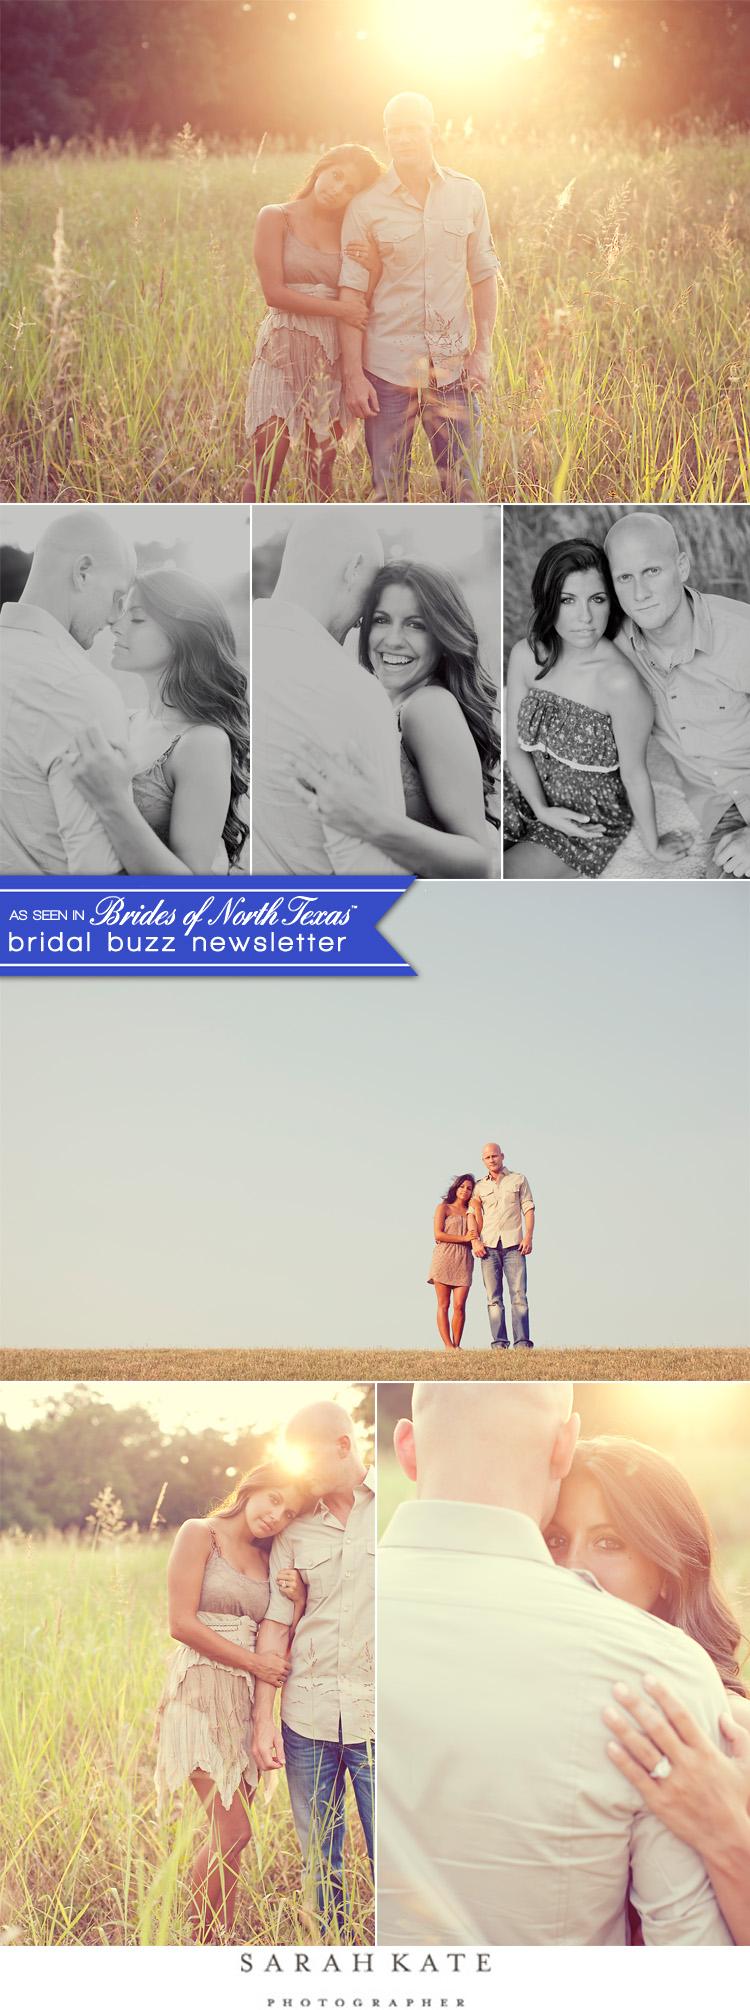 Dallas Fort Worth wedding photographer Sarah Kate Photographer